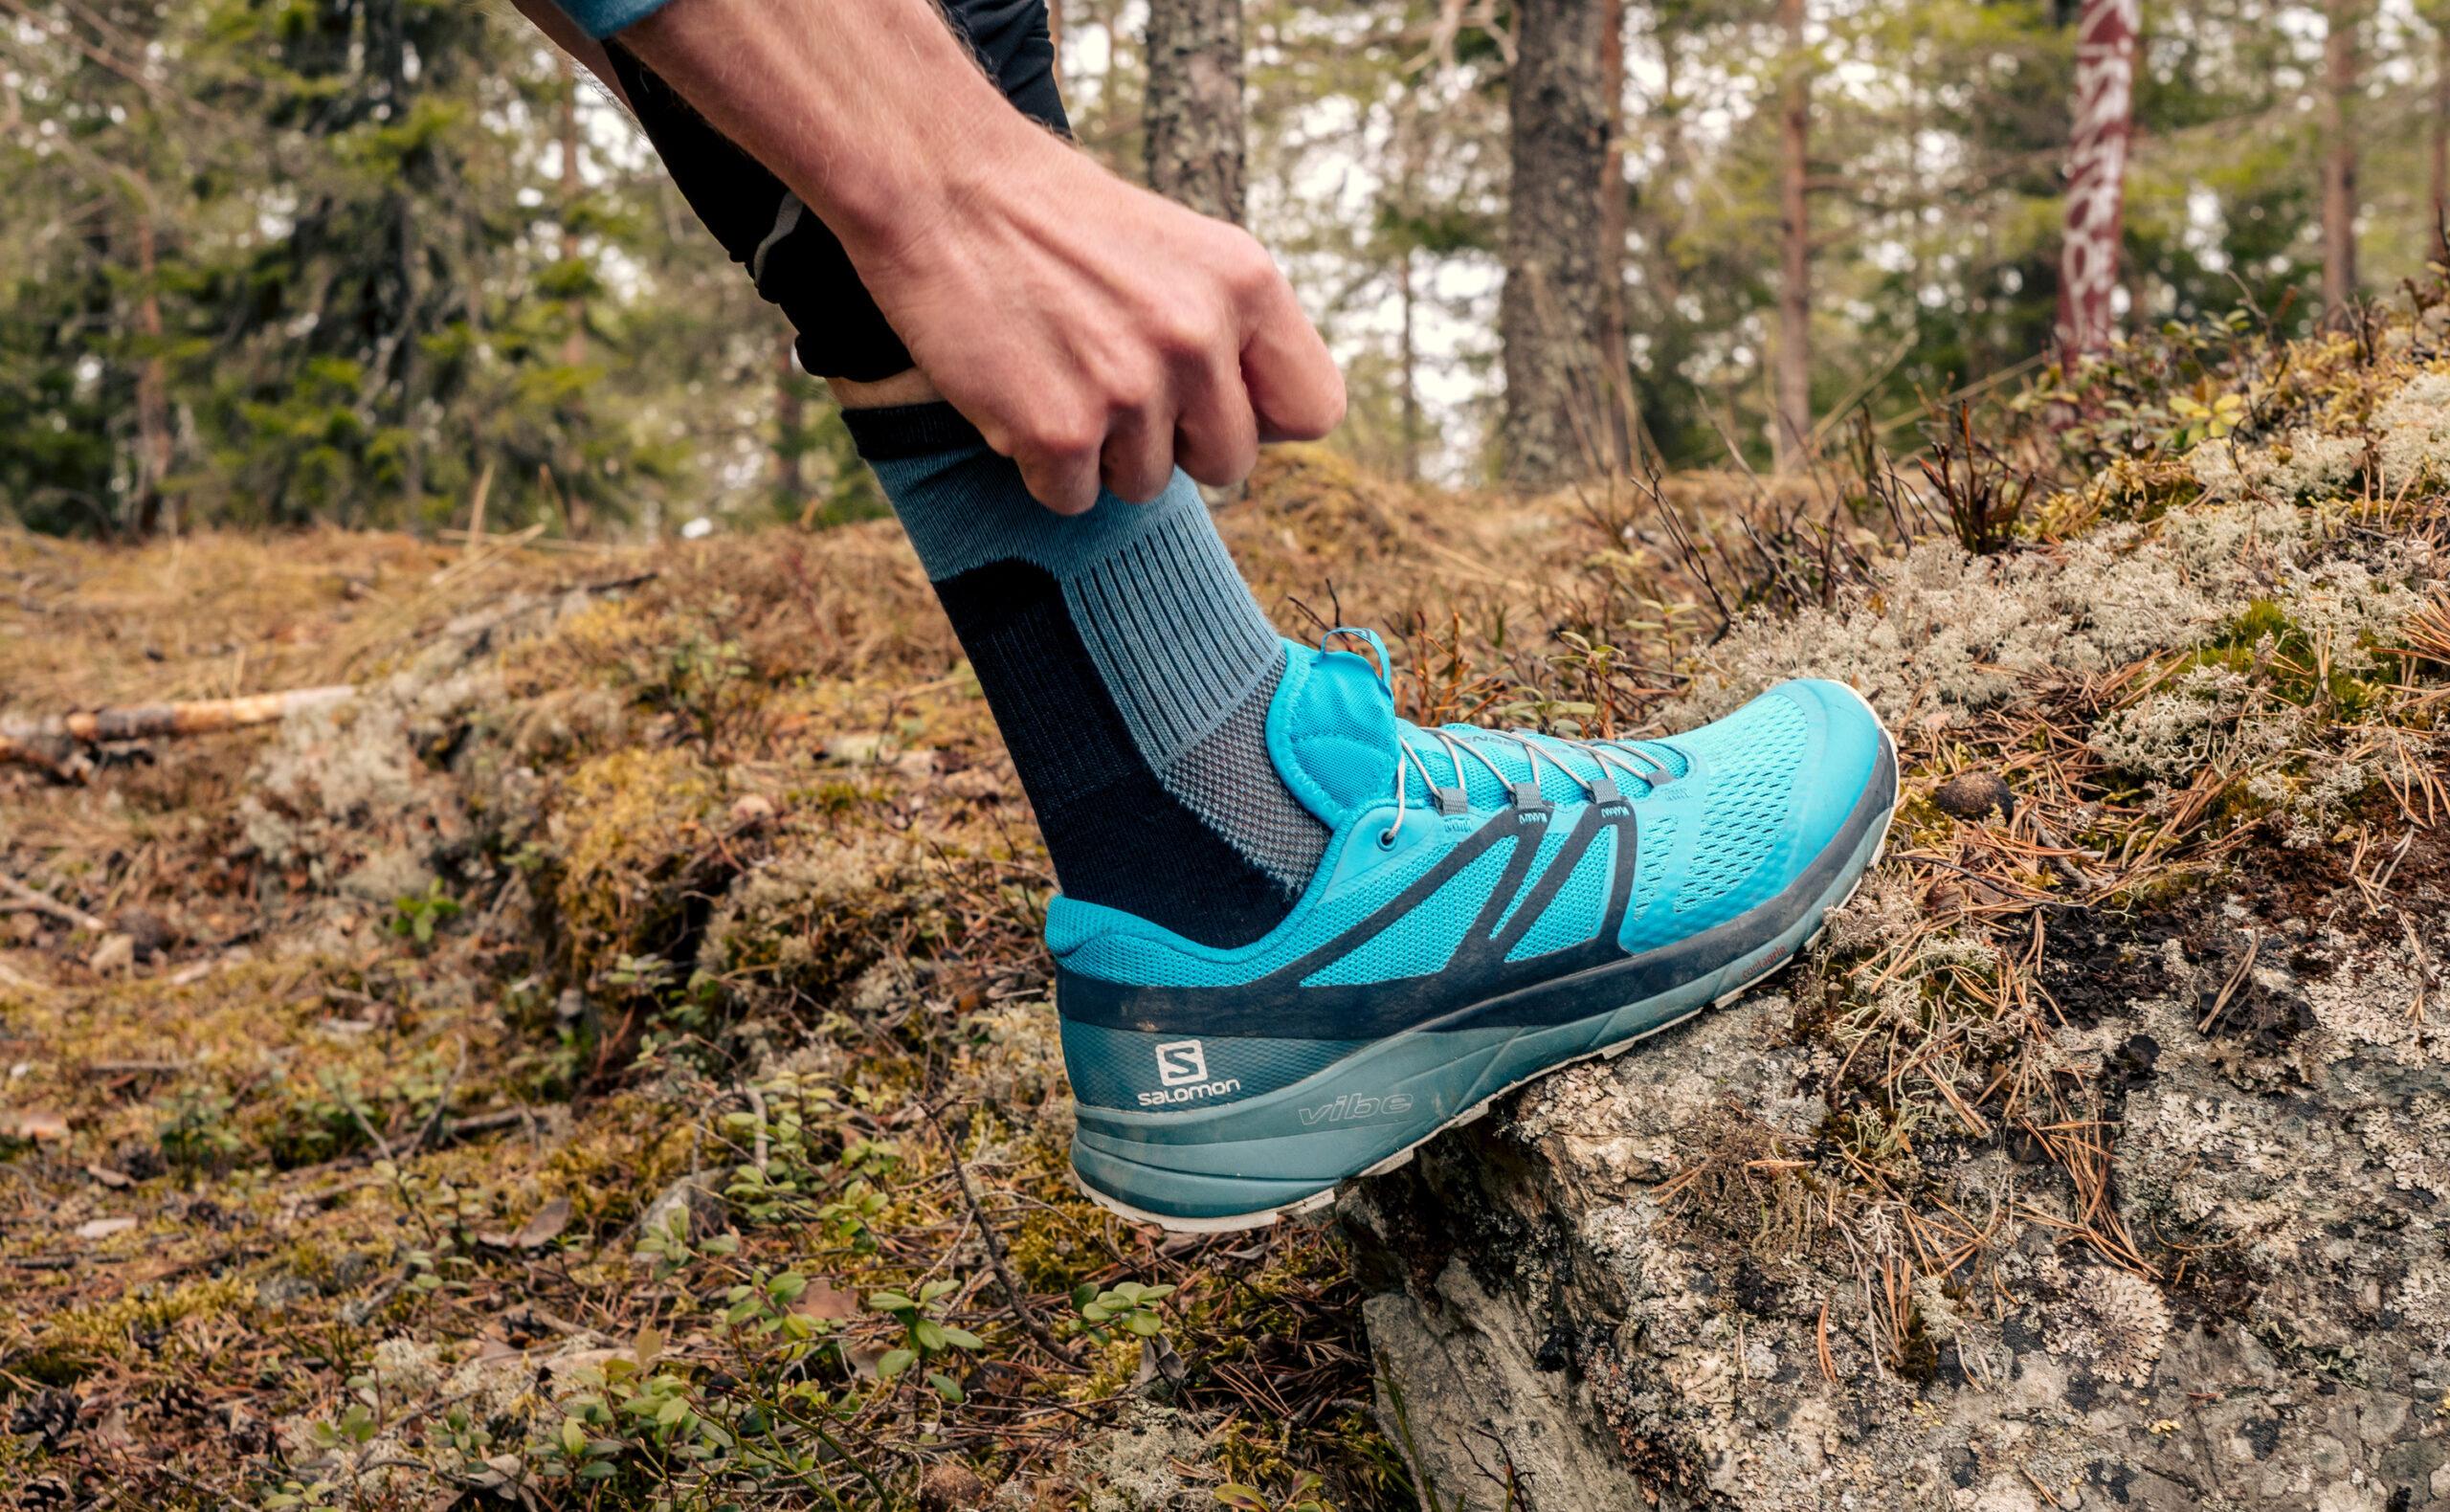 Skilled sock in running shoe